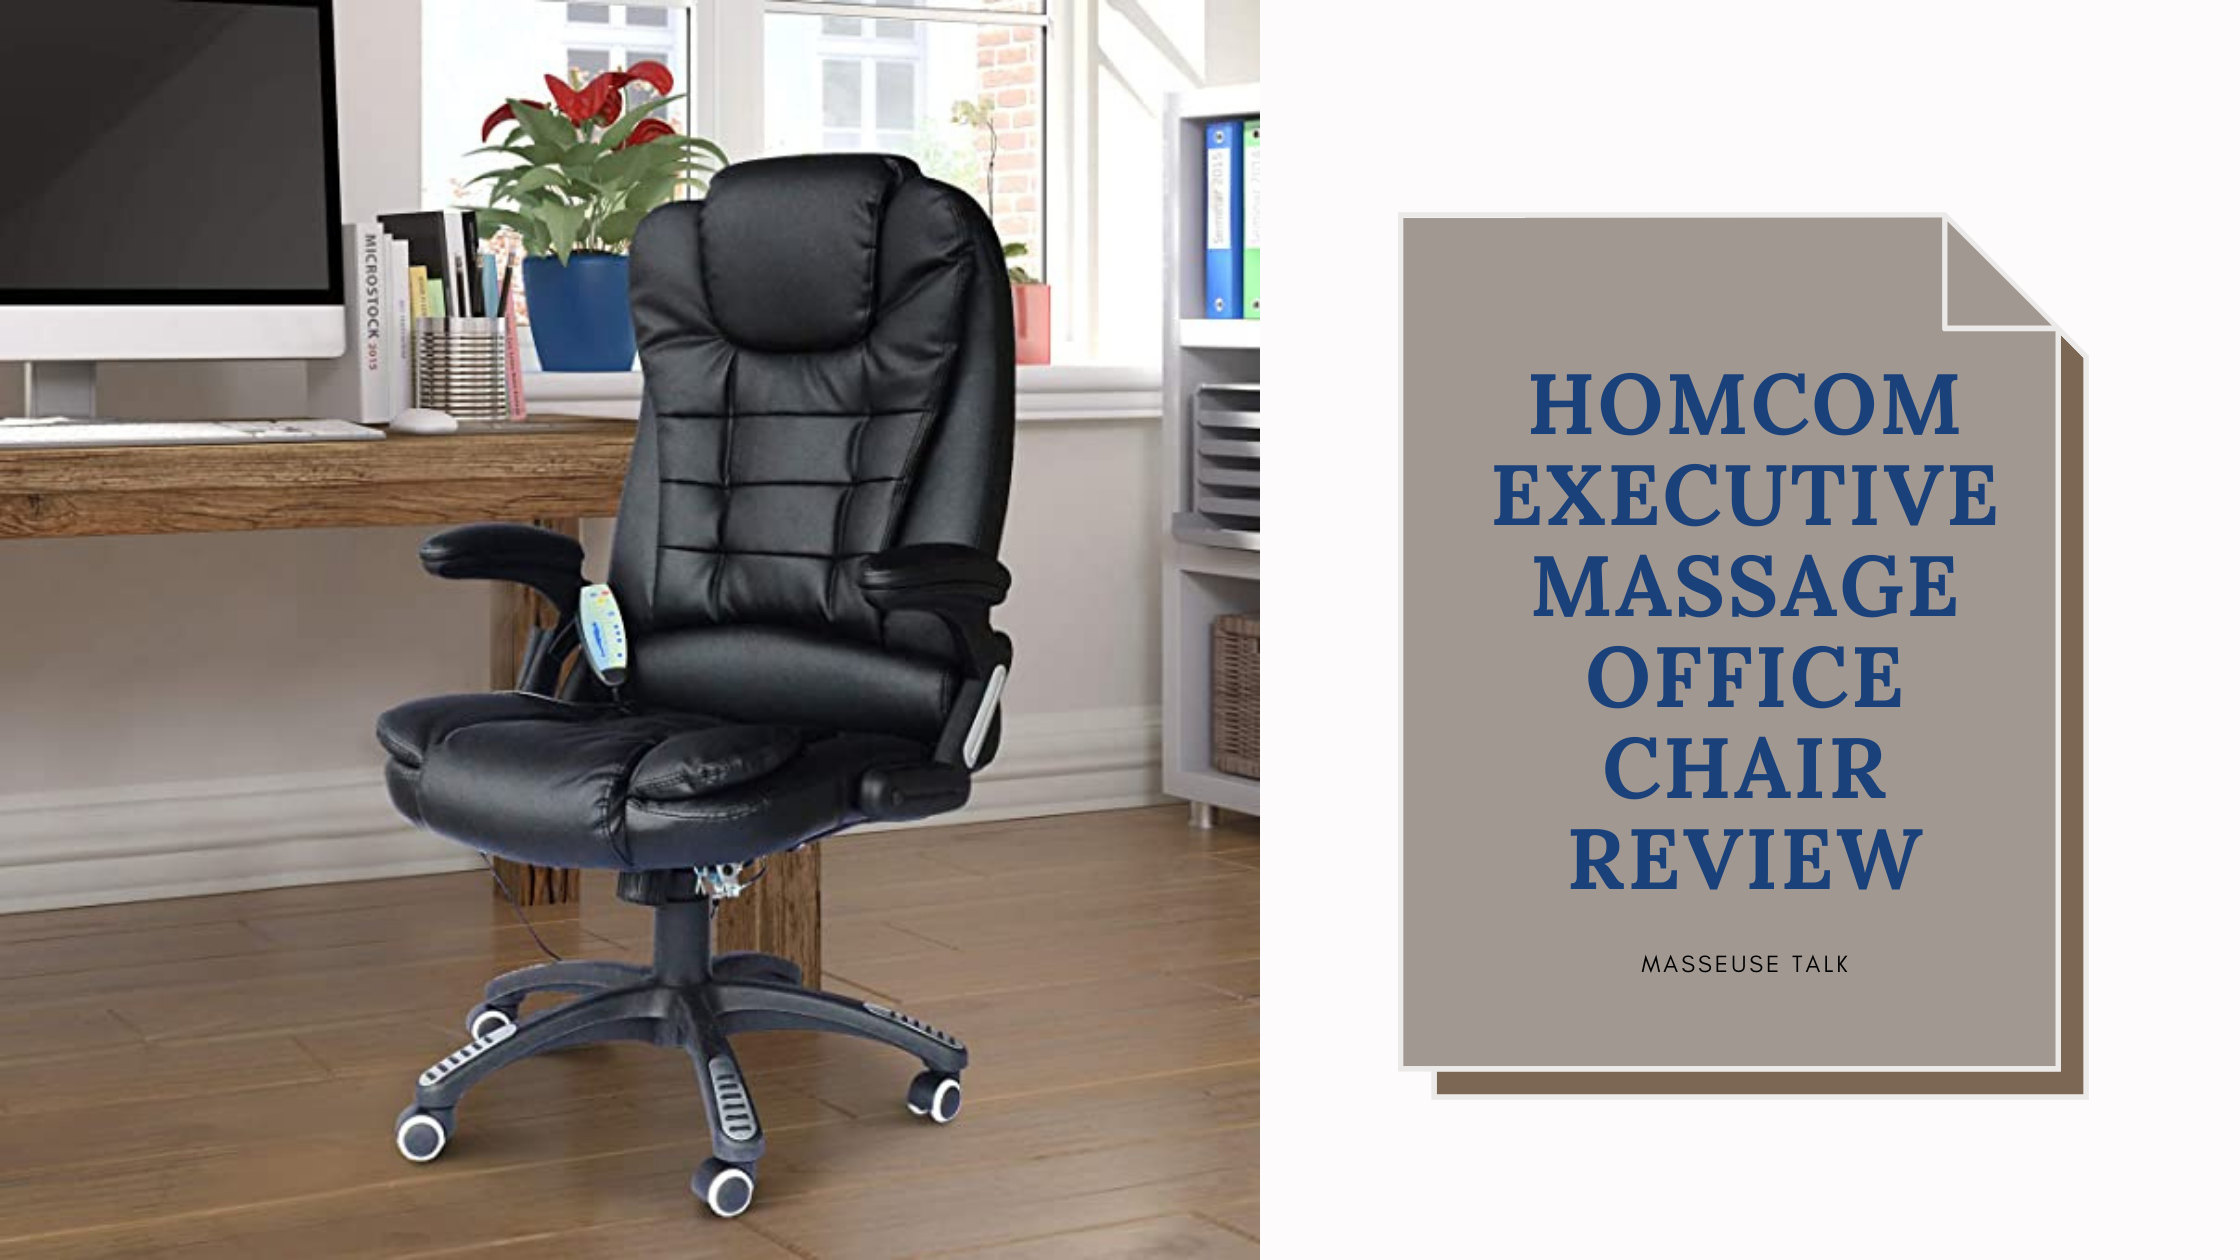 Homcom Massage Office Chair